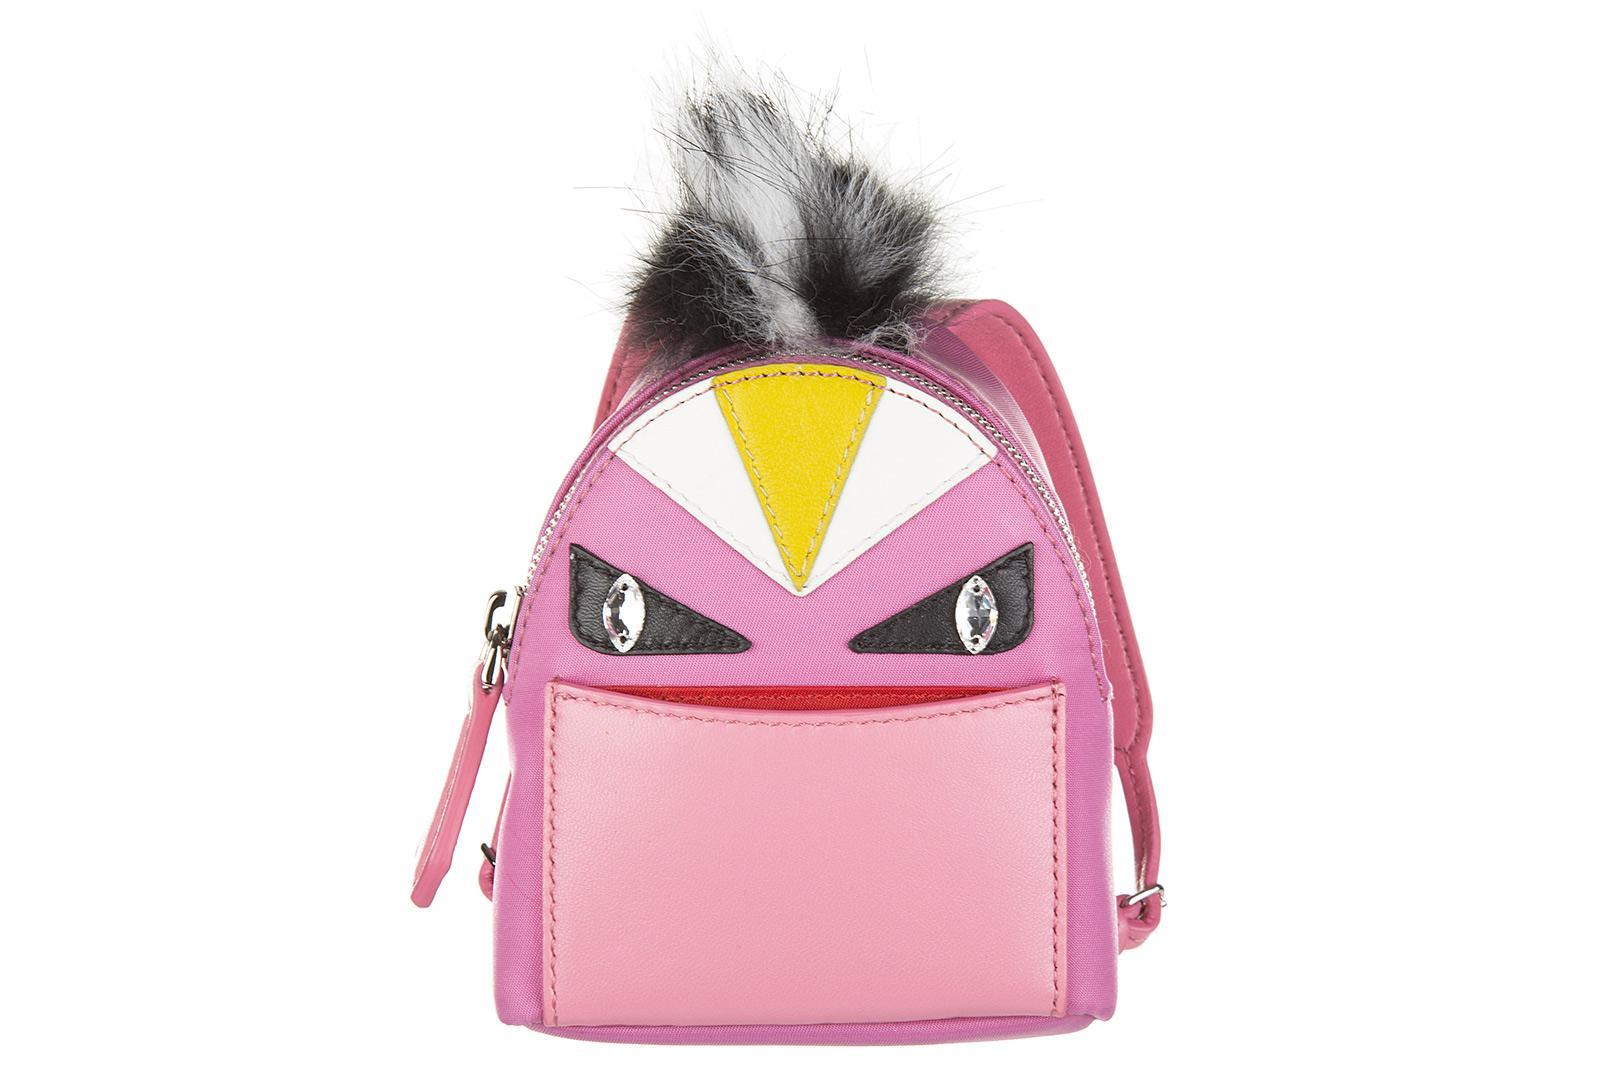 3663bf52b508 Fendi Women s Bag Charm Bag Bugs In Pink